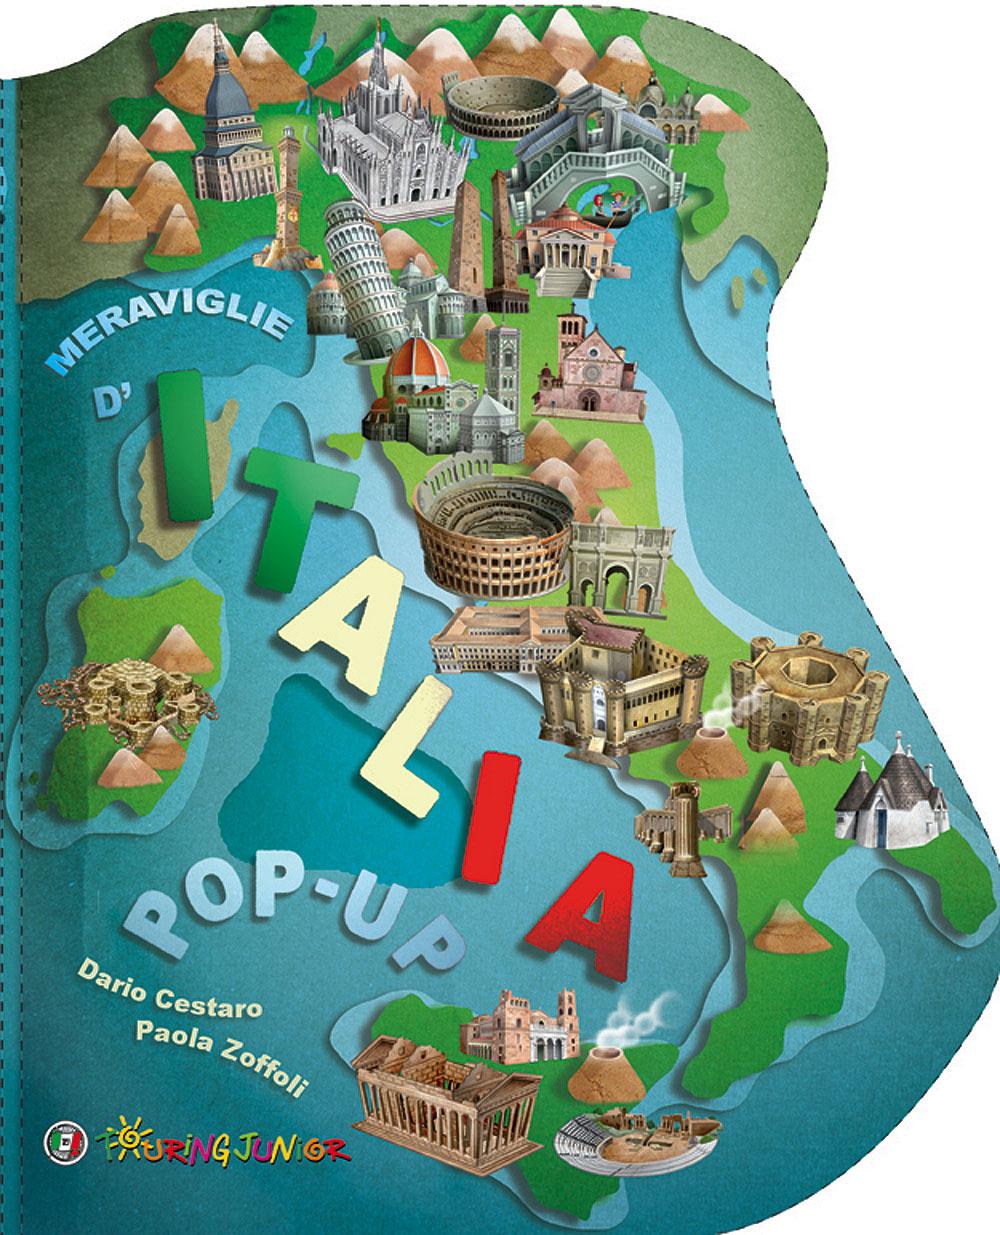 Meraviglie d 39 italia pop up touring editore libreria online touring editore srl - Eliminare finestre pop up ...